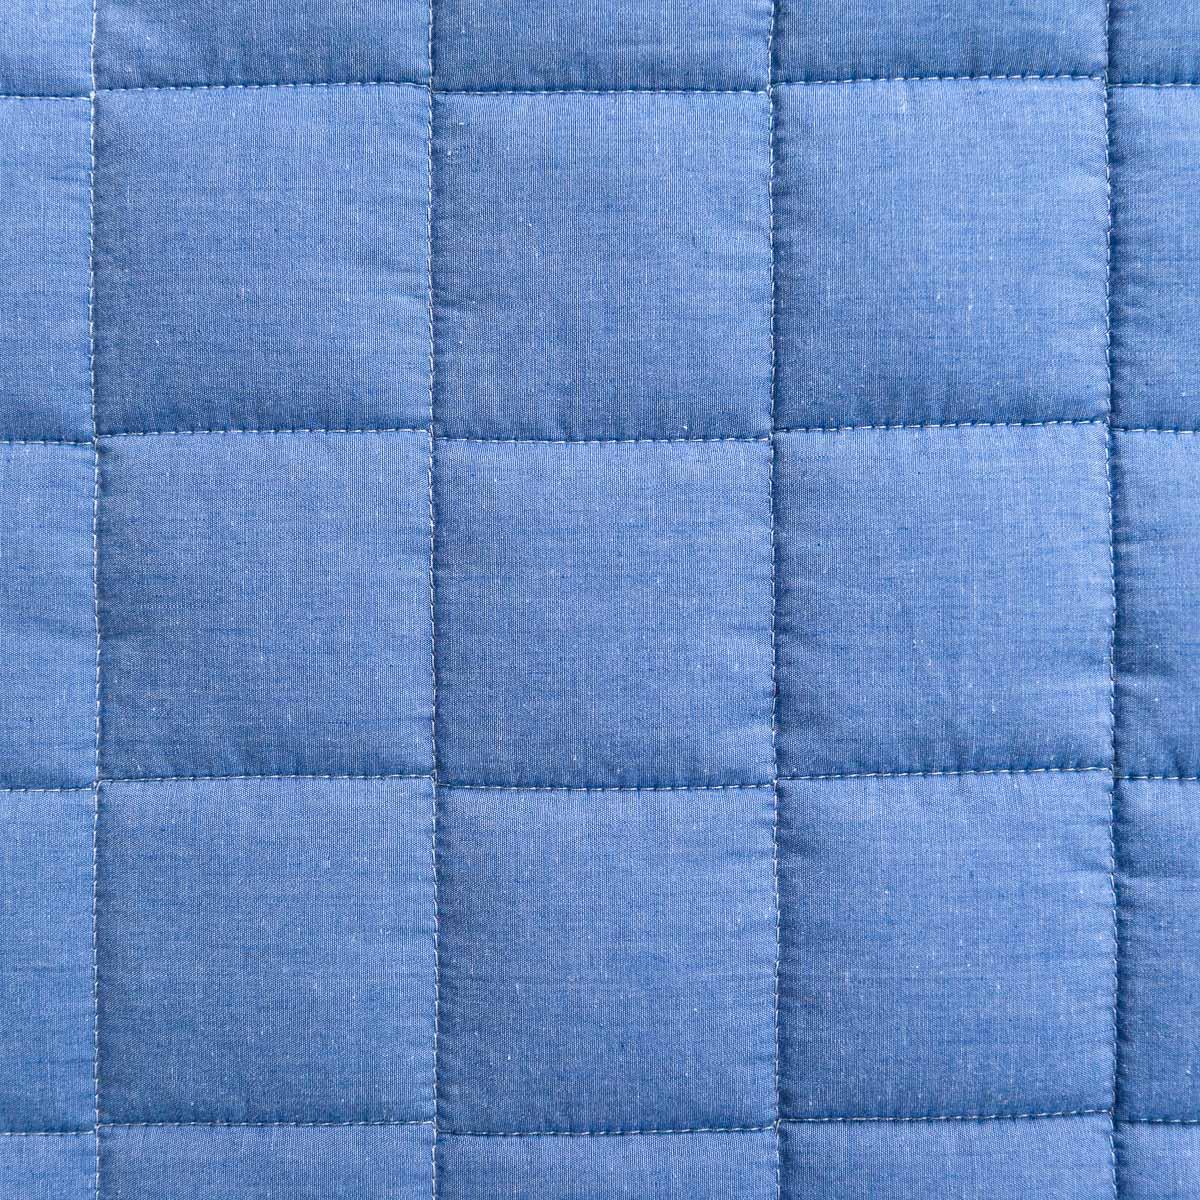 Colcha Com Elástico Chambray Azul Jeans